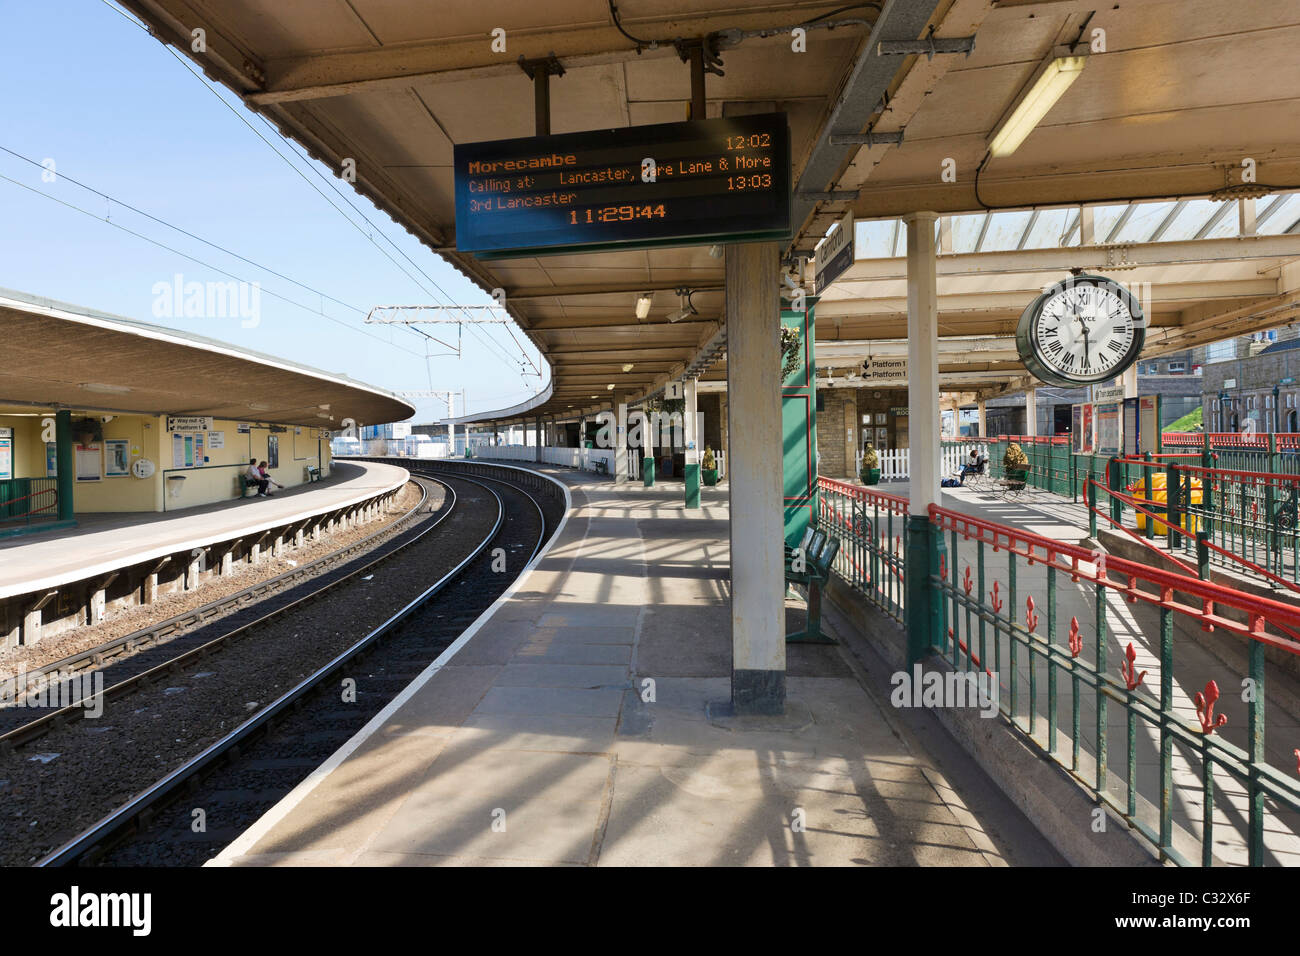 Carnforth Railway Station (location for the 1945 film 'Brief Encounter'), Carnforth, Lancashire, UK - Stock Image